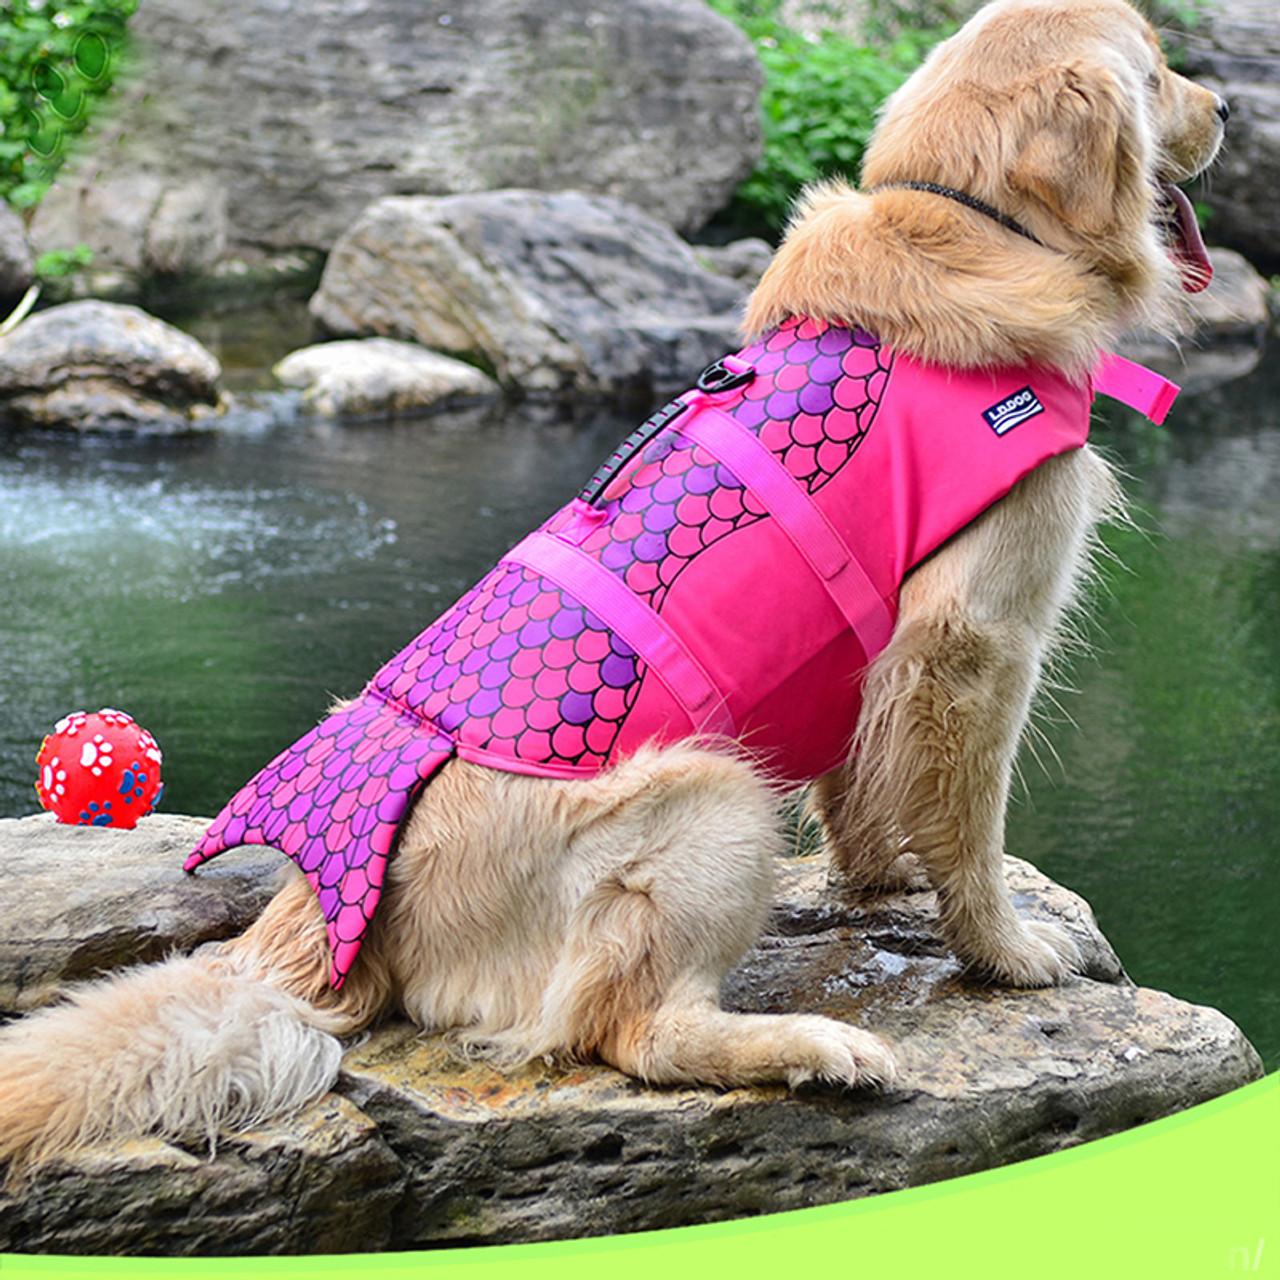 Life Jacket Safety Clothes For Dog Life Vest Summer Clothes Saver